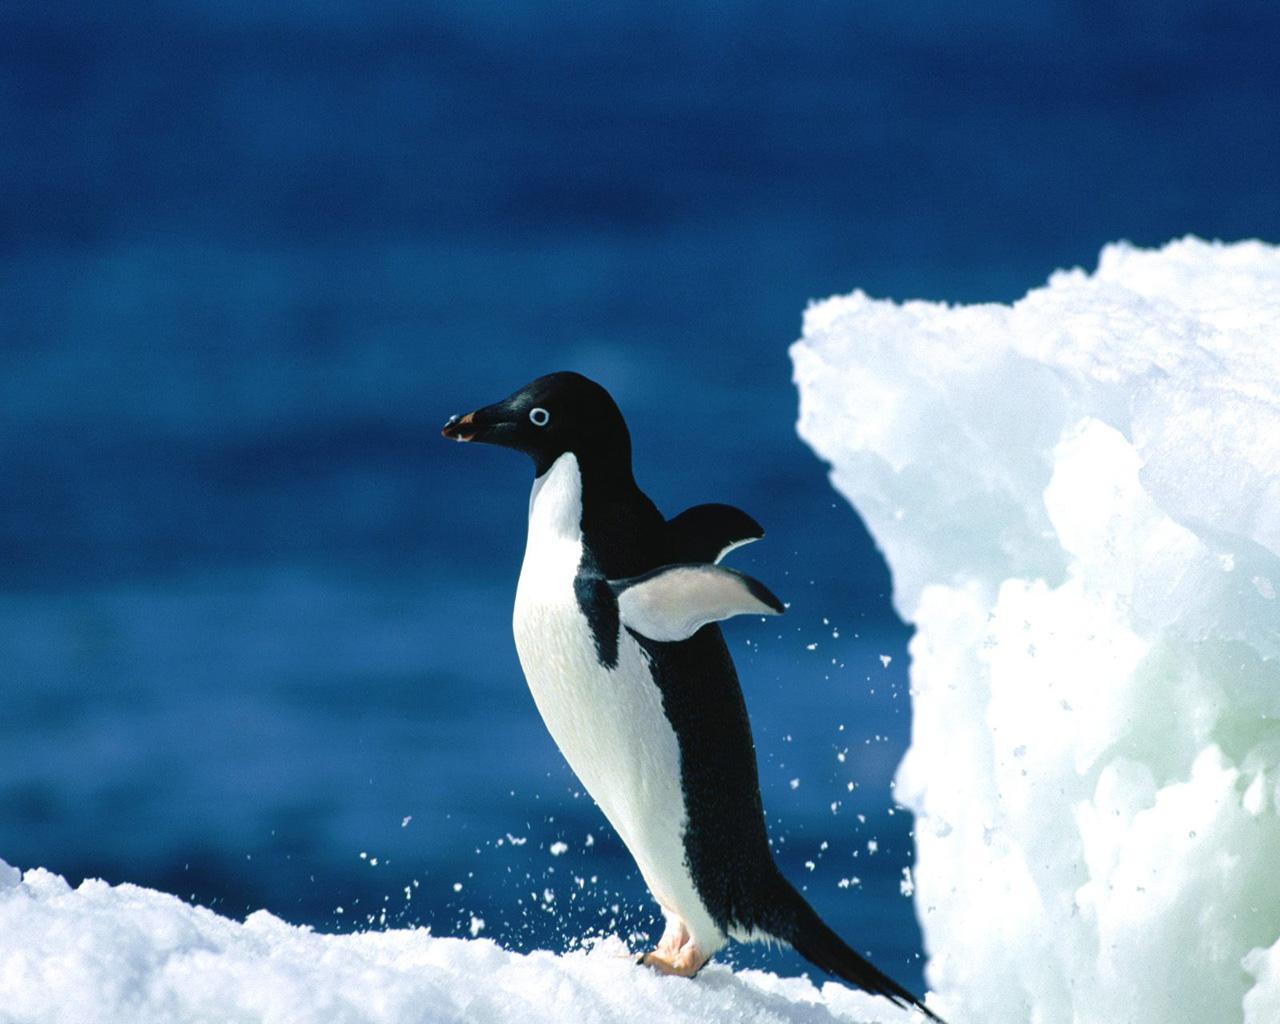 Bird Penguin 1280x1024